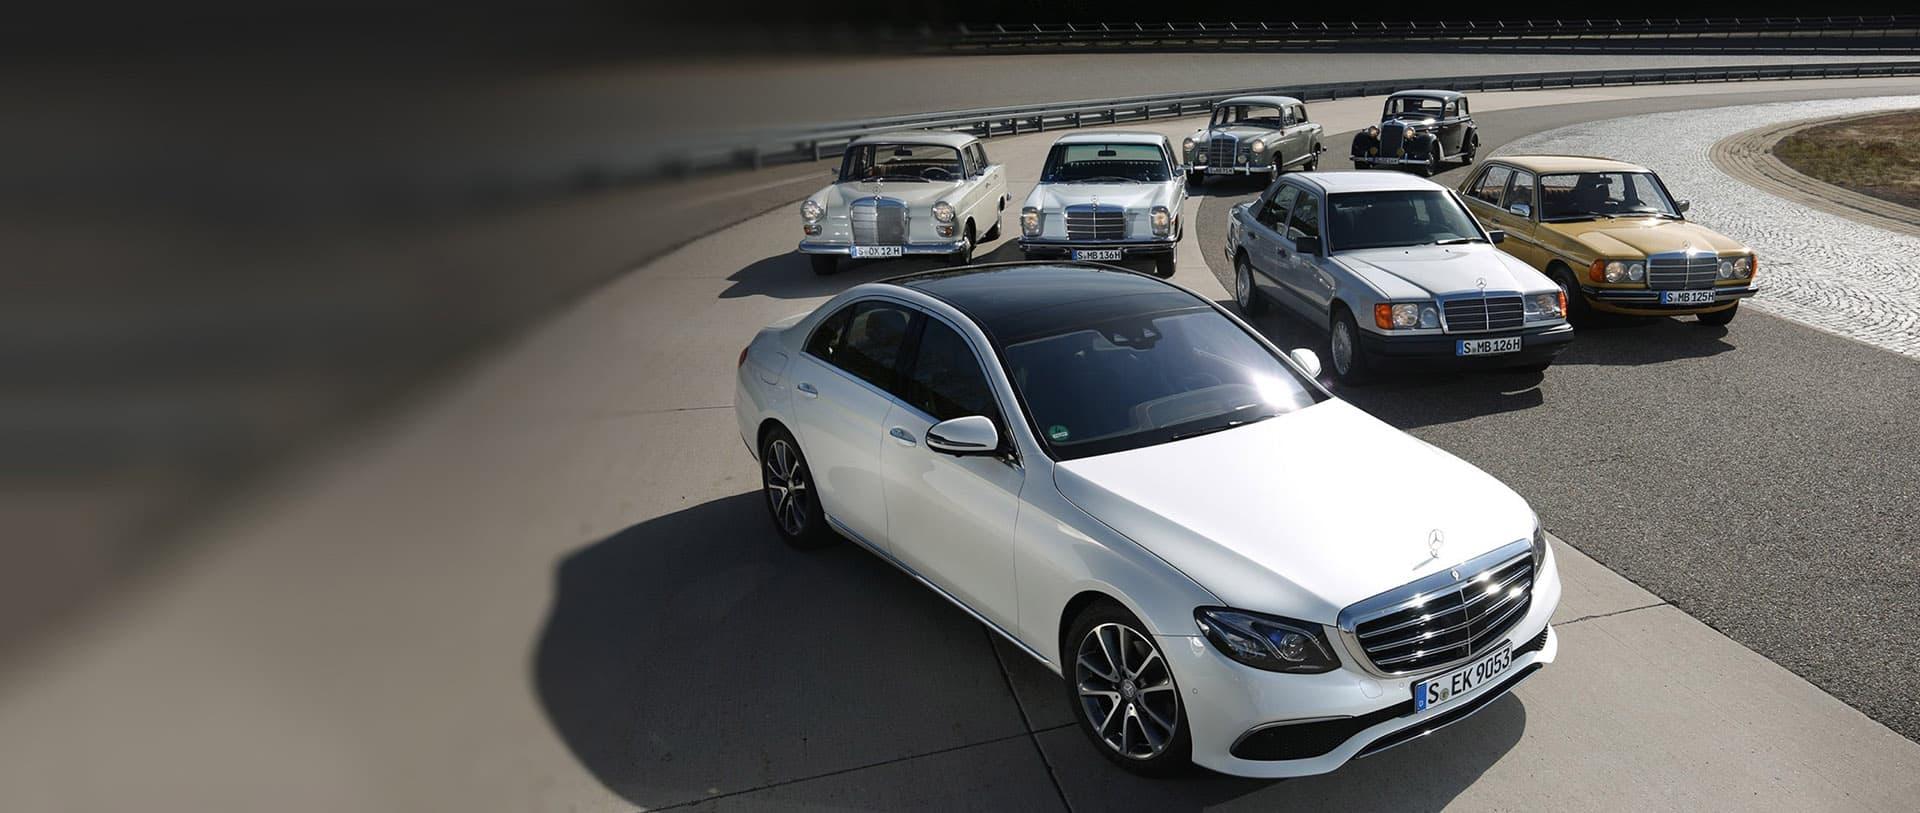 Mercedes-Benz E-Class - як створювалася легендарна модель